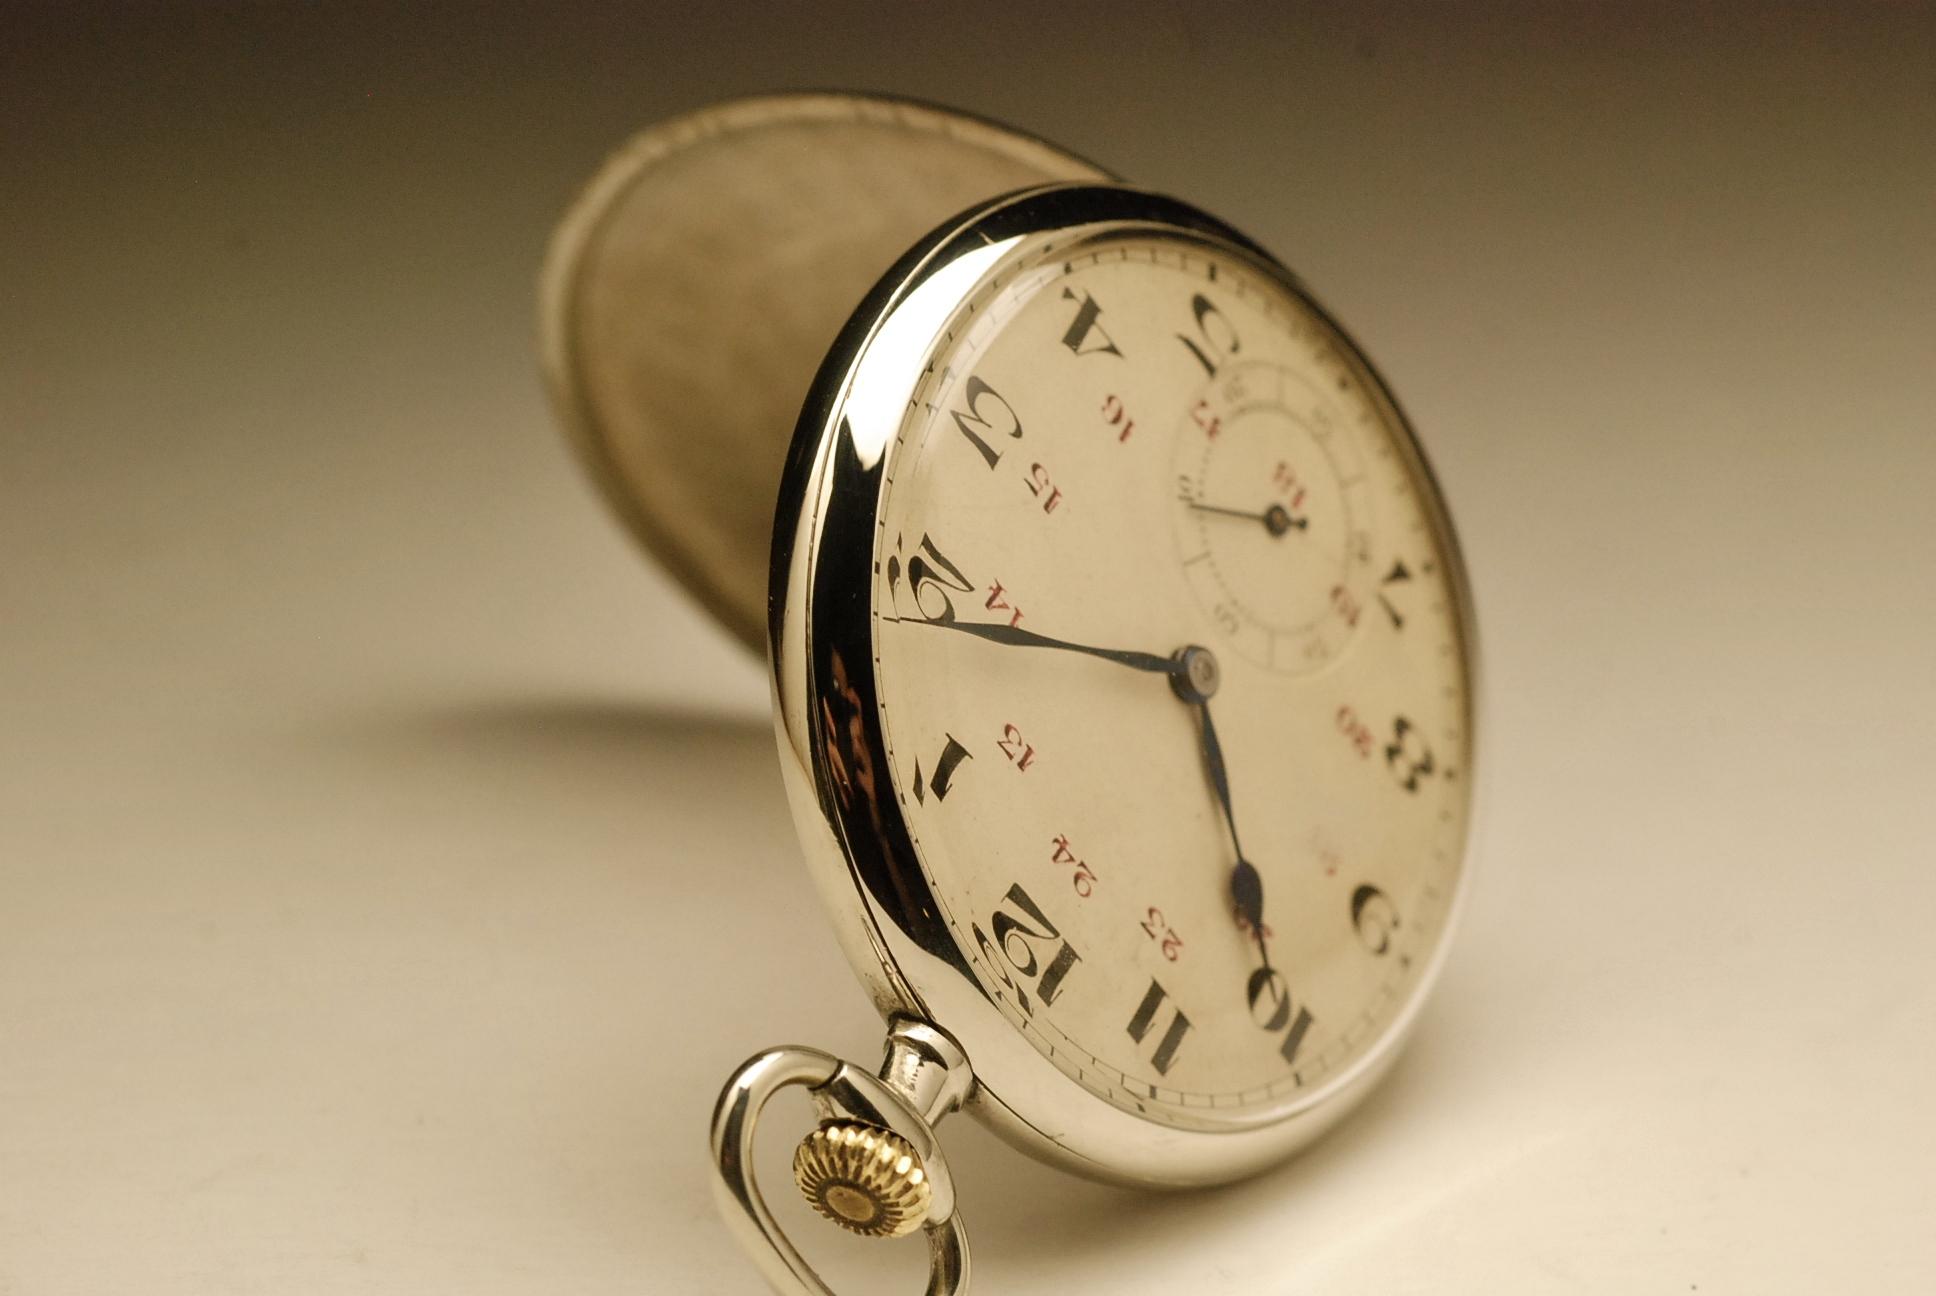 eterna vintage pocket watch montre ancienne gousset circa. Black Bedroom Furniture Sets. Home Design Ideas